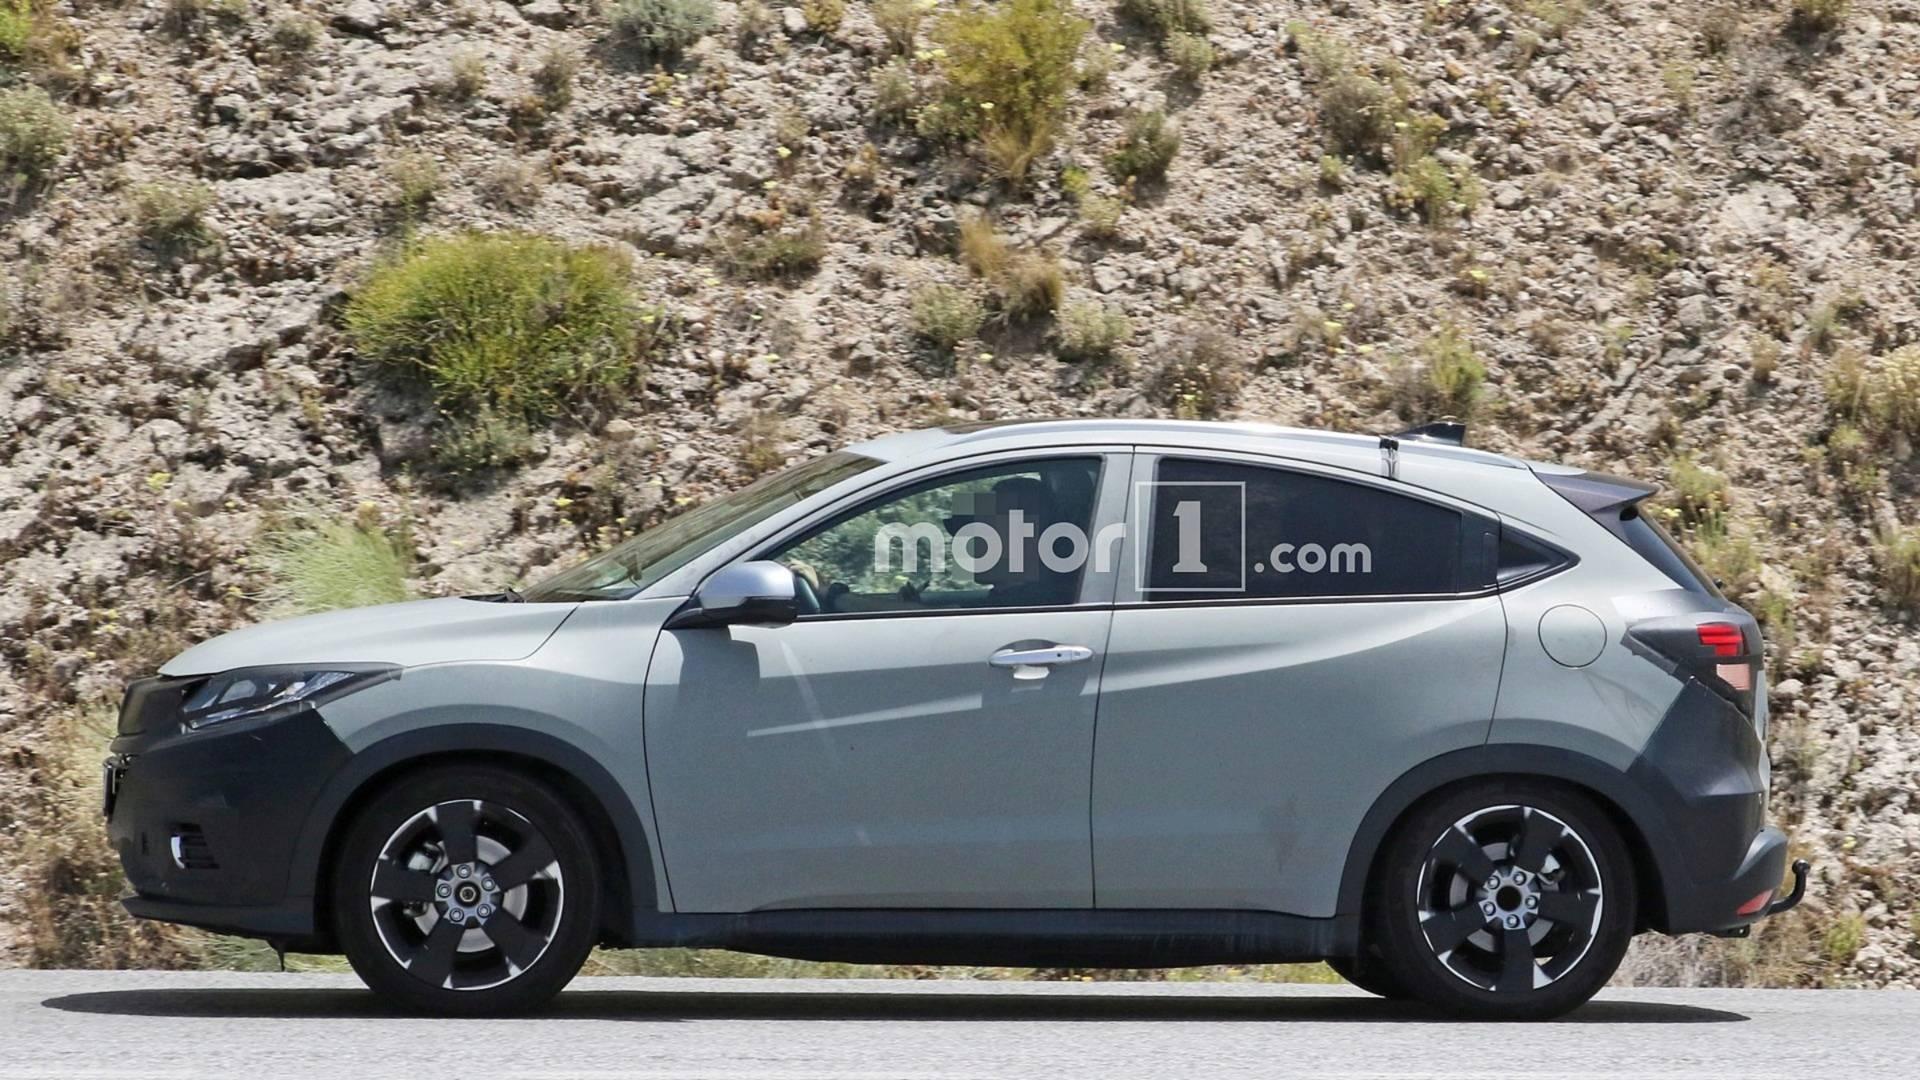 Honda Hr V Spied Hiding Discreet Facelift